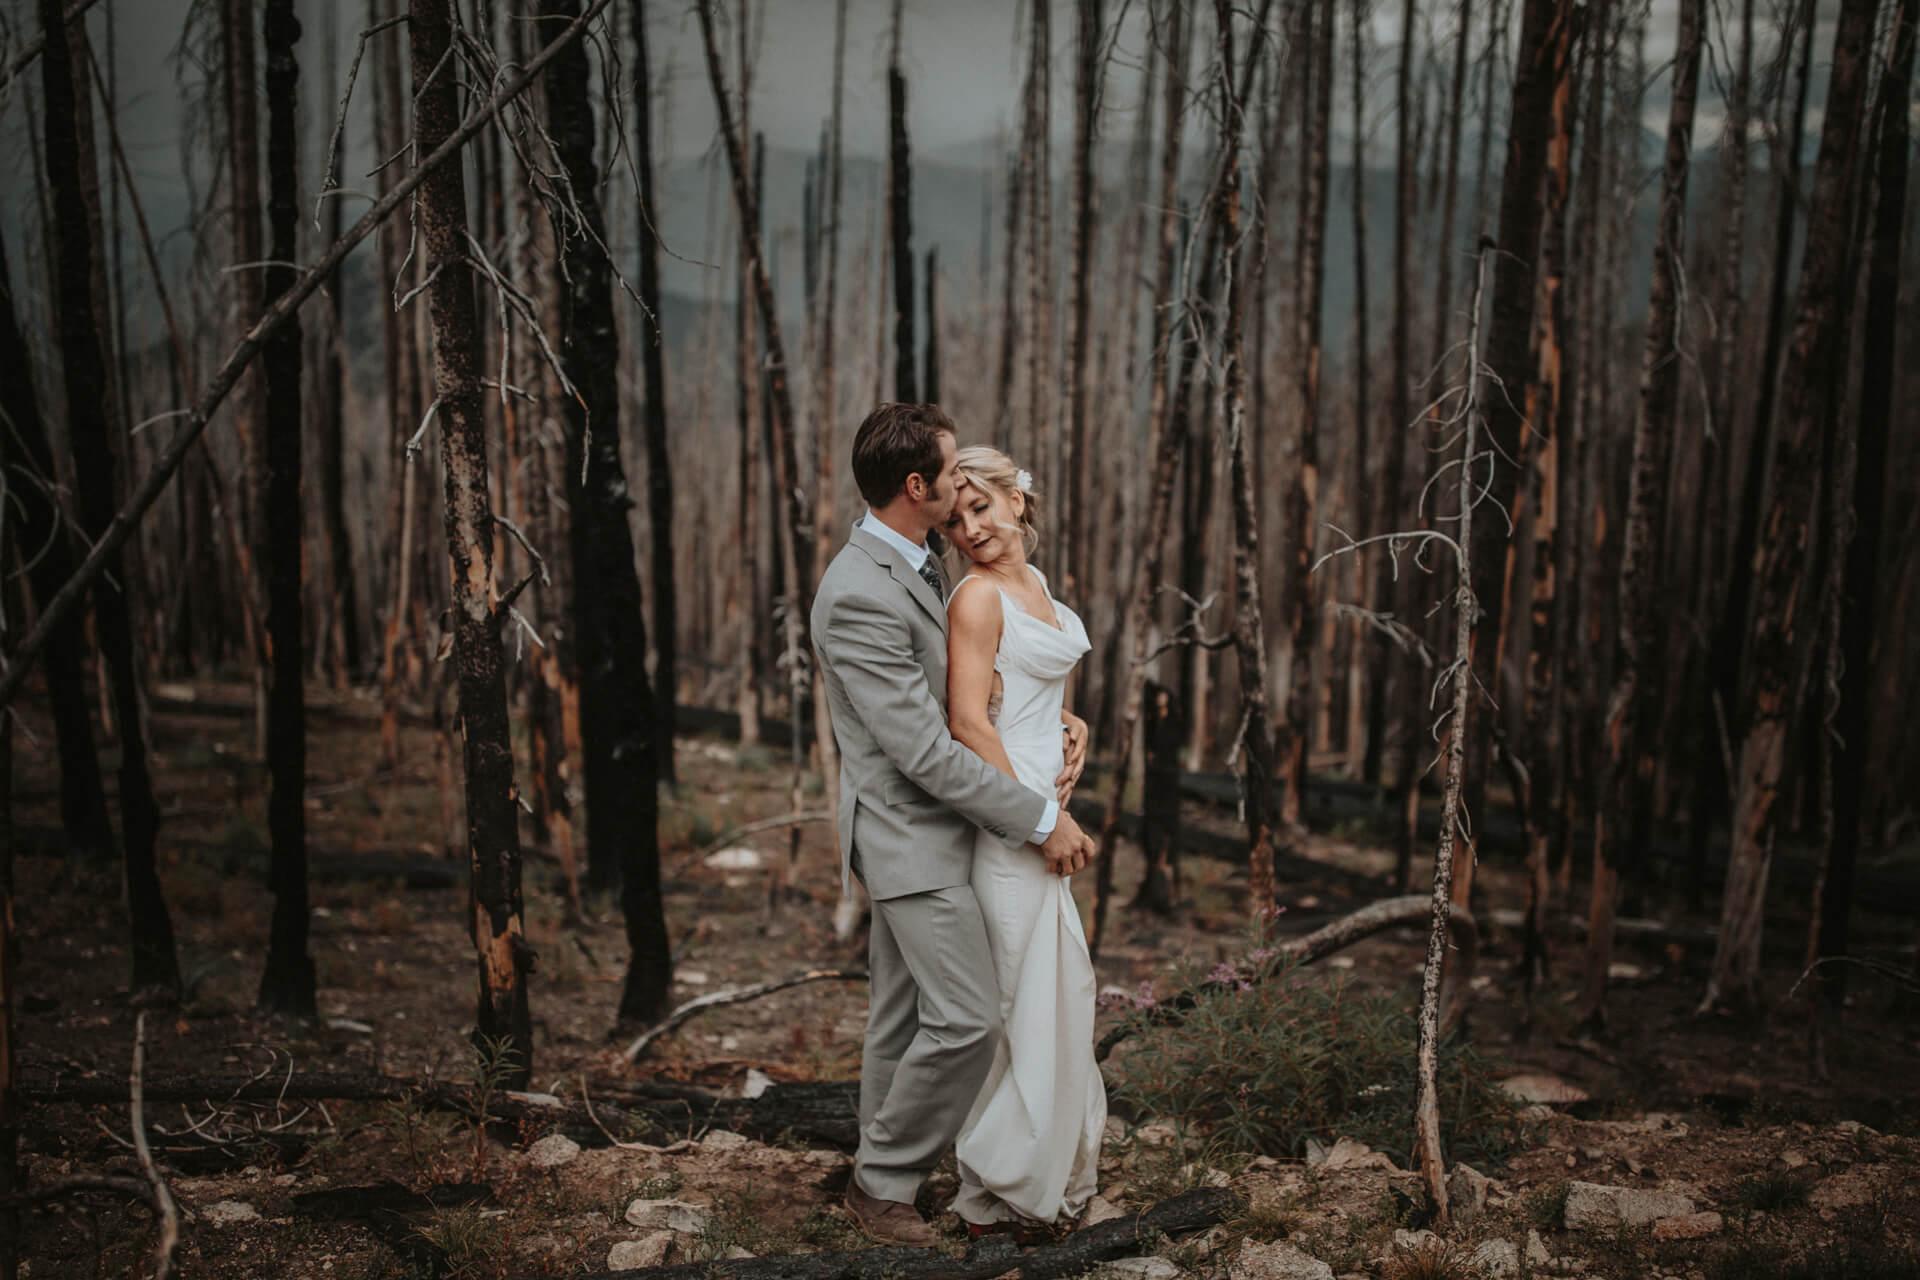 Iowa City Wedding Photography | Cluney Photography